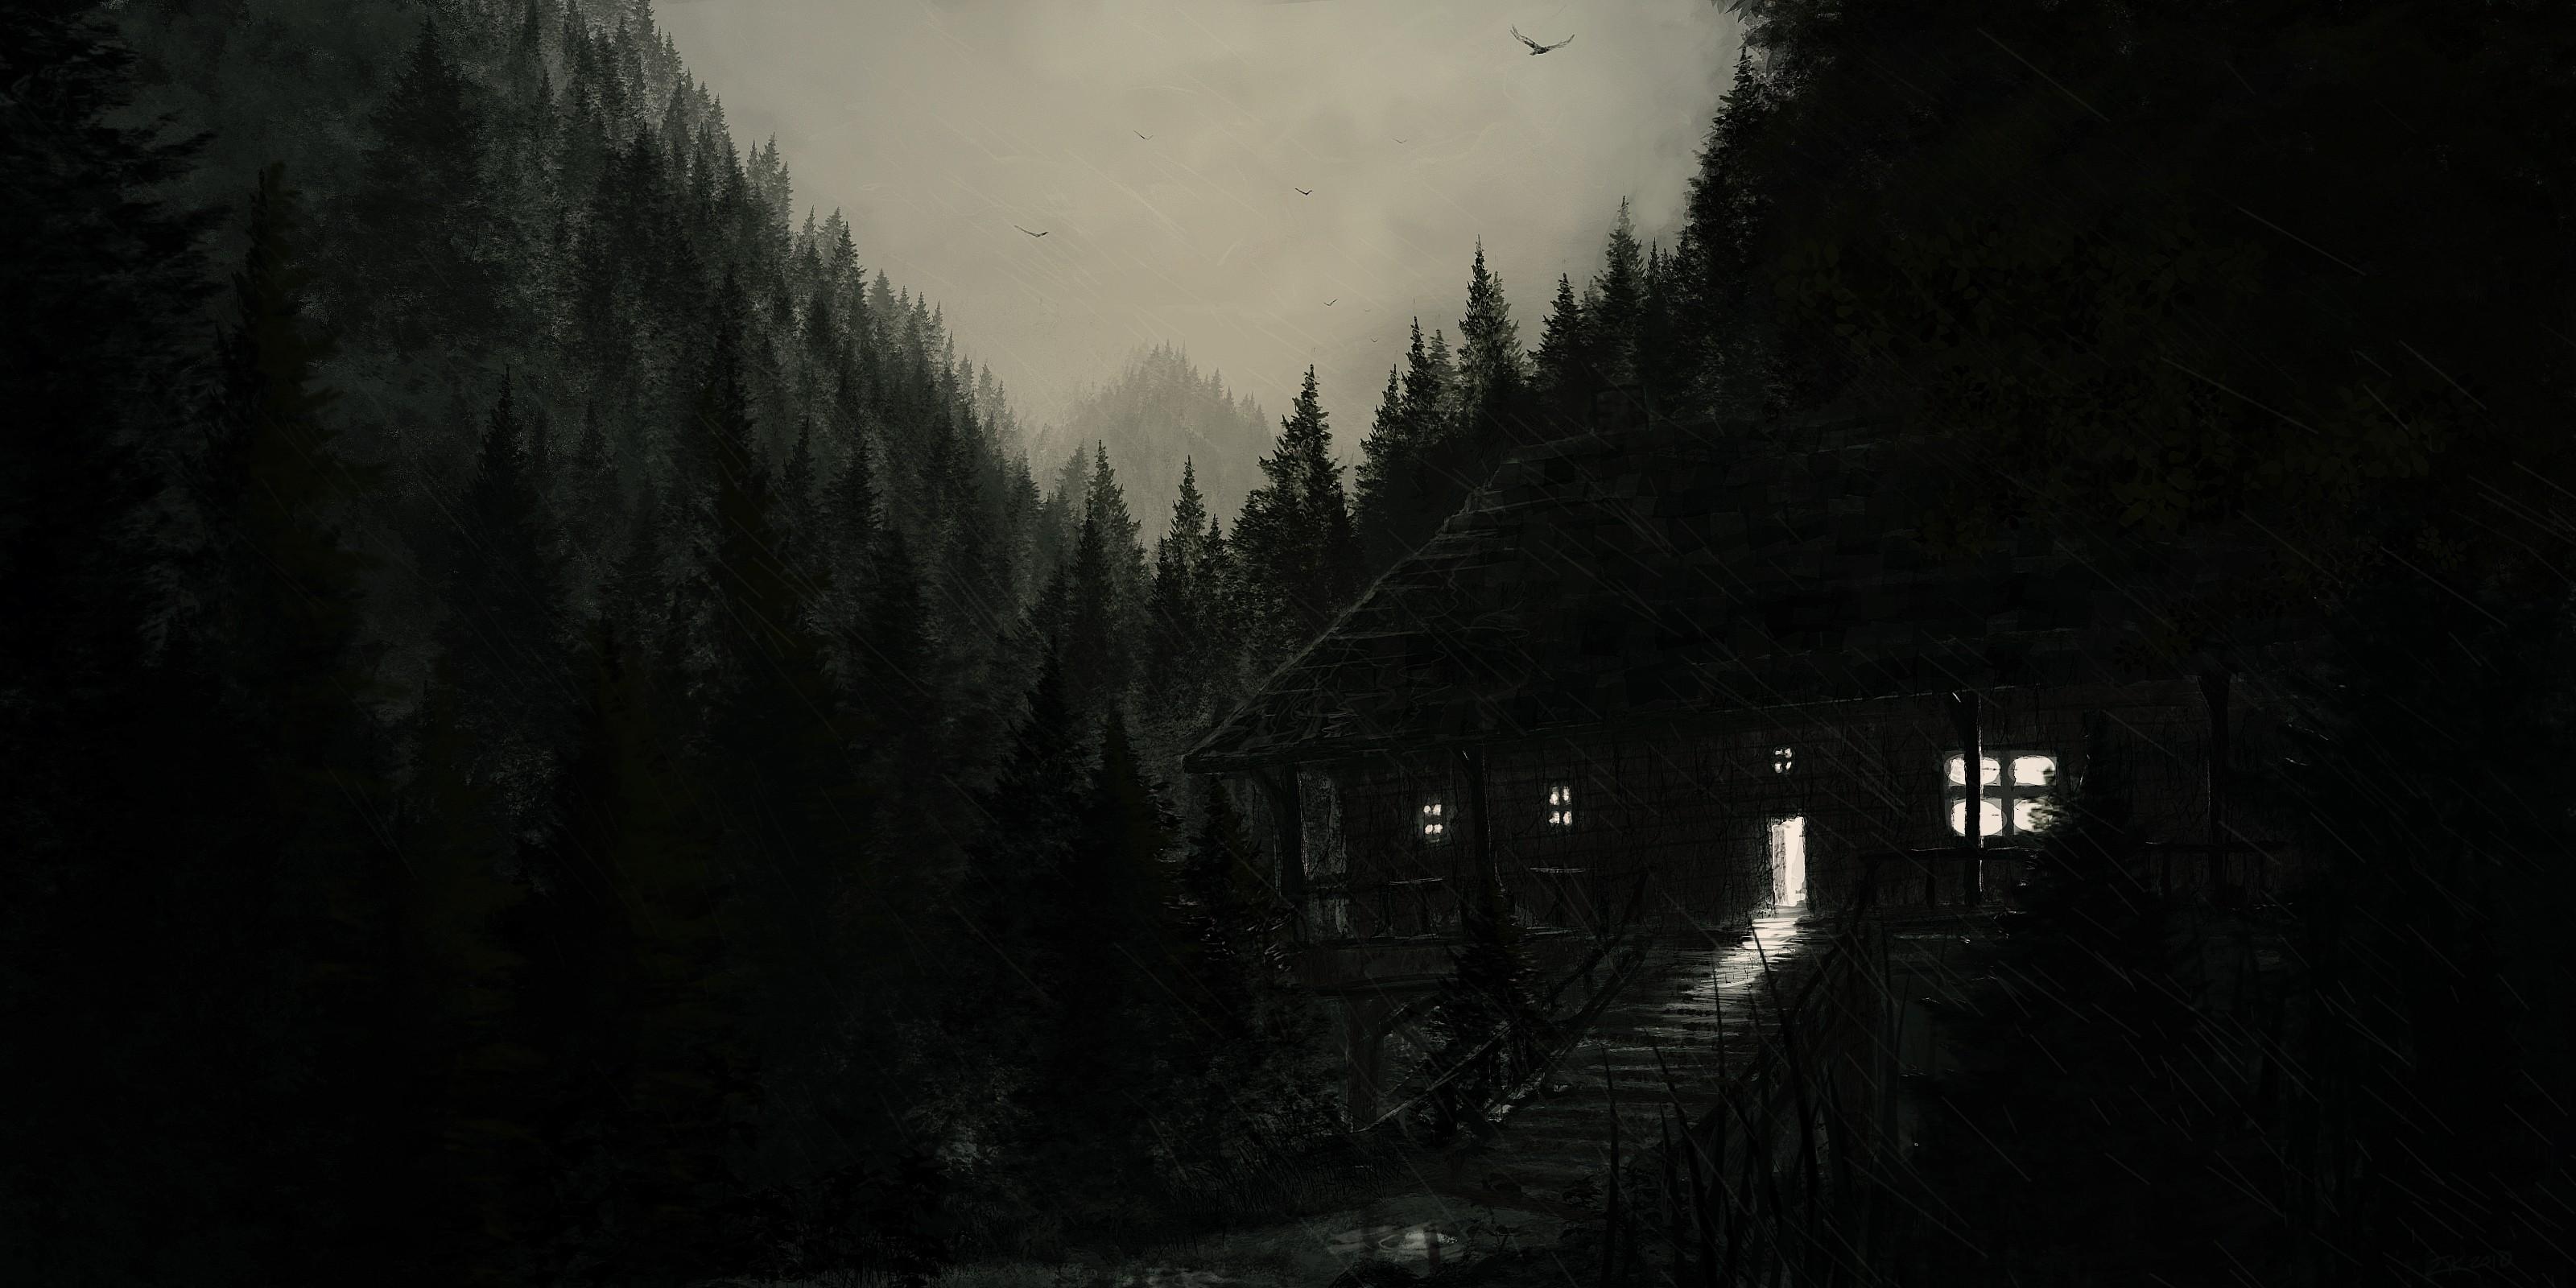 Fantastic Wallpaper Mountain Rain - sunlight-forest-mountains-digital-art-monochrome-night-snow-winter-rain-morning-mist-atmosphere-Antichristofer-light-tree-fog-weather-darkness-atmospheric-phenomenon-3200x1600-px-568122  You Should Have_30991.jpg